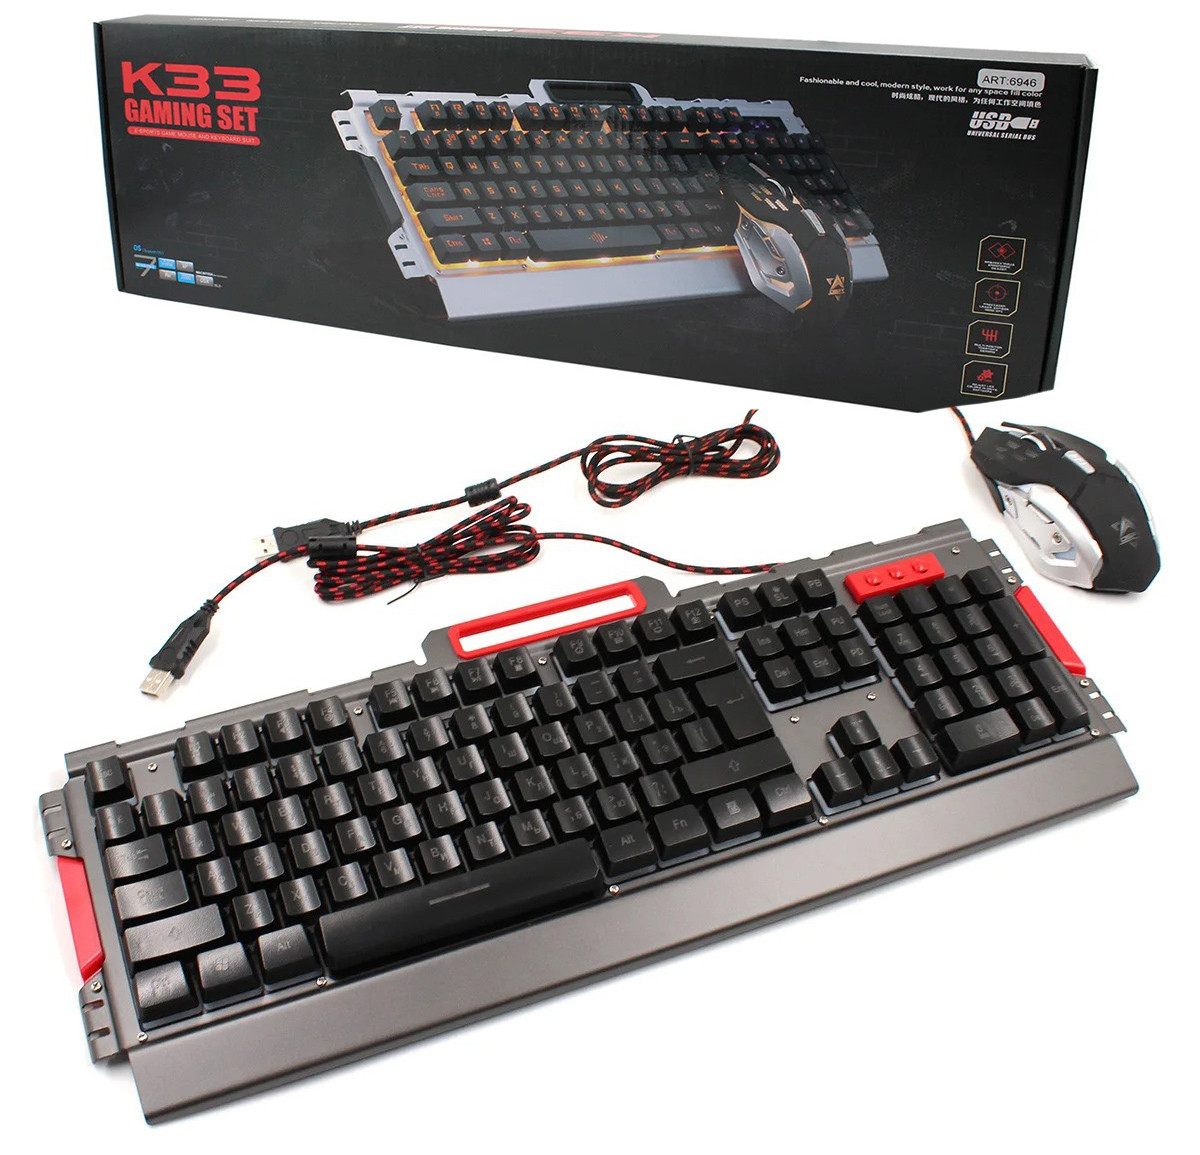 Клавиатура LED GAMING KEYBOARD+Mouse K33